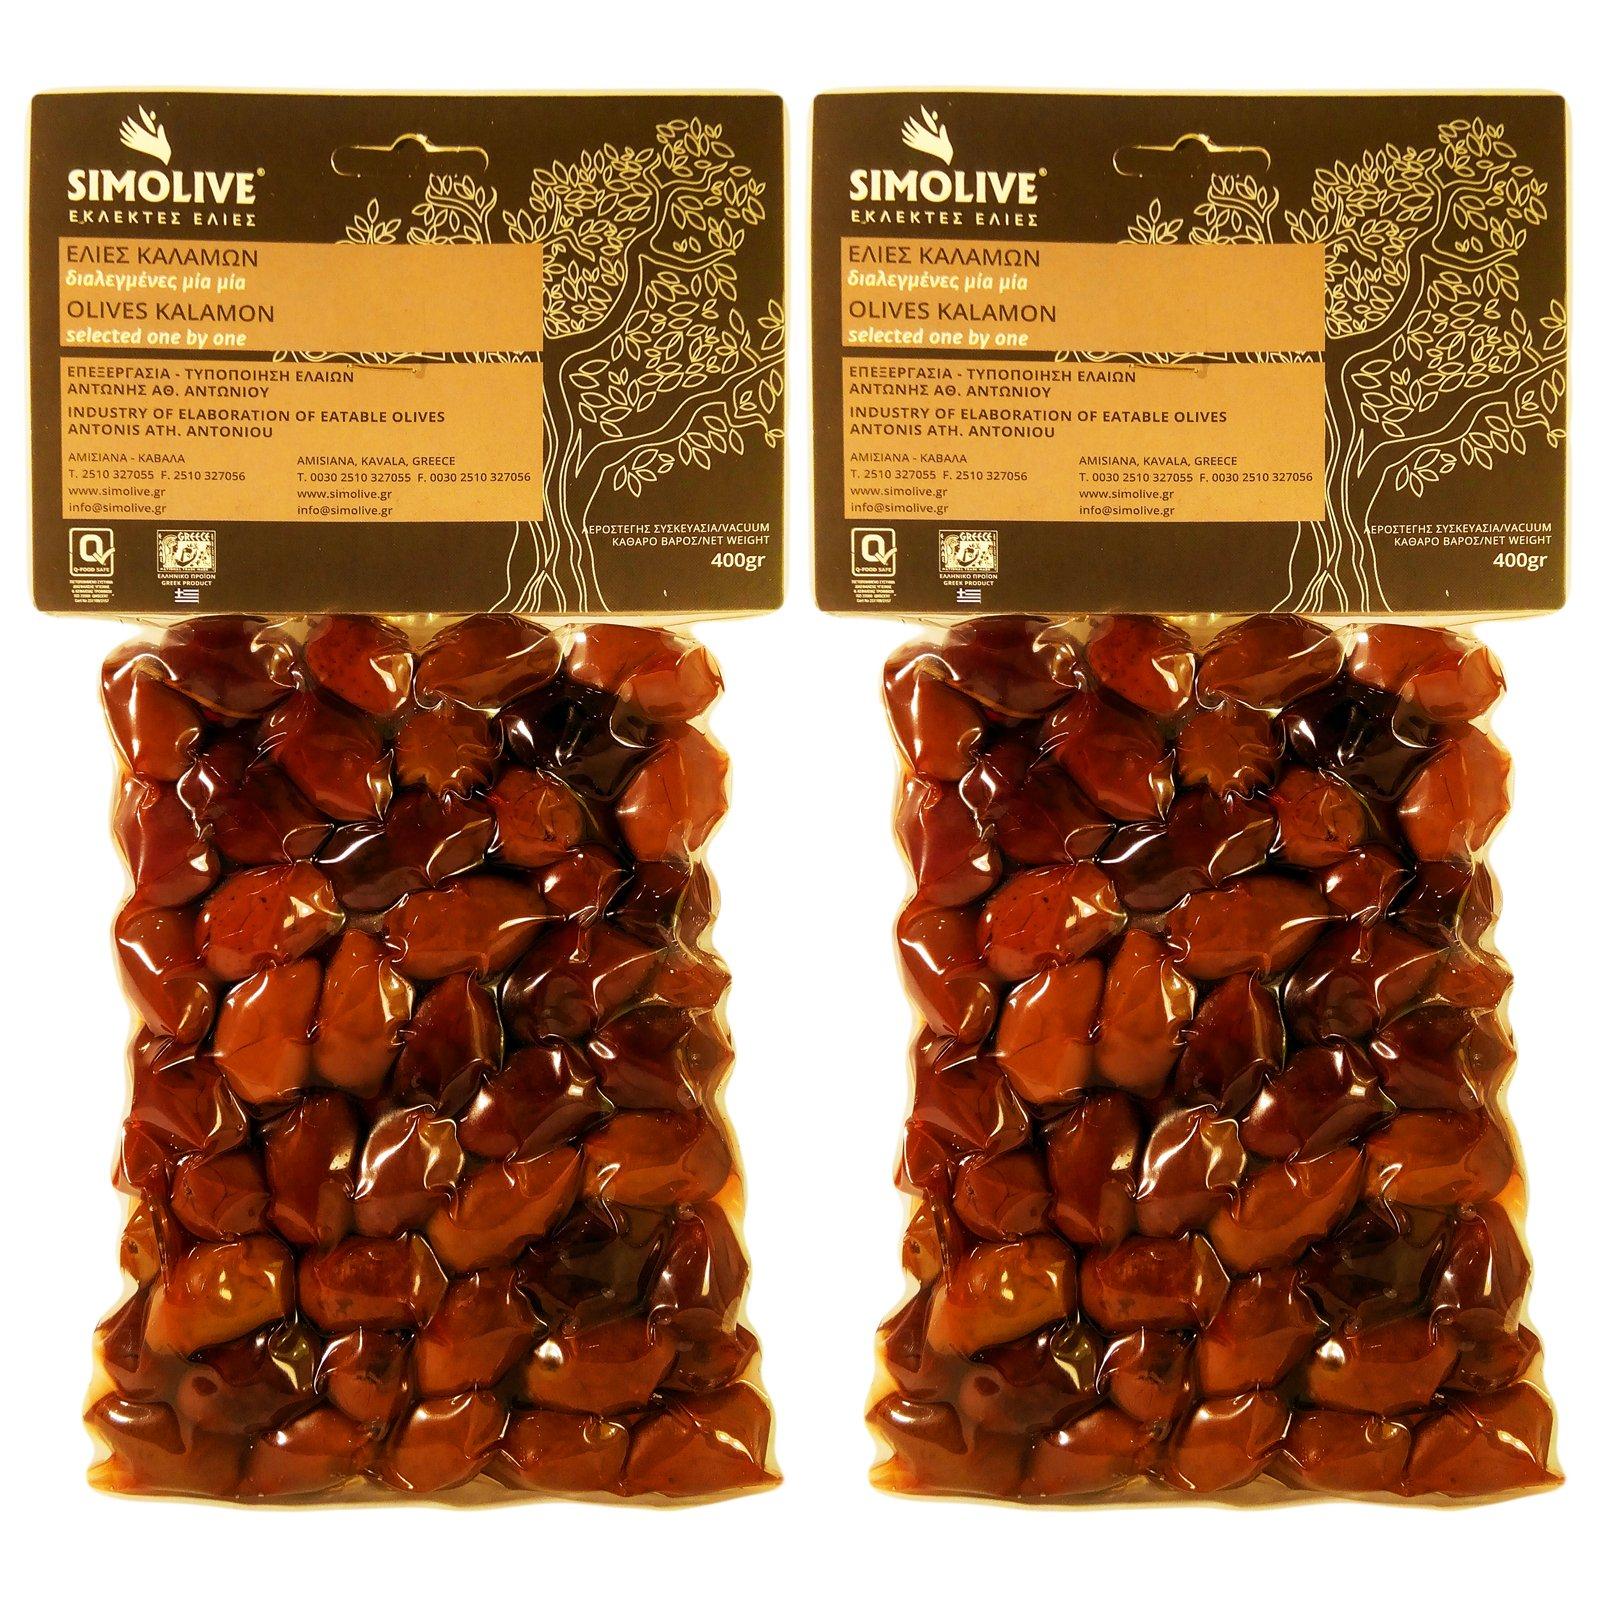 Simolive Greek Kalamata Olives 800gr Vacuum-sealed Plastic Bag